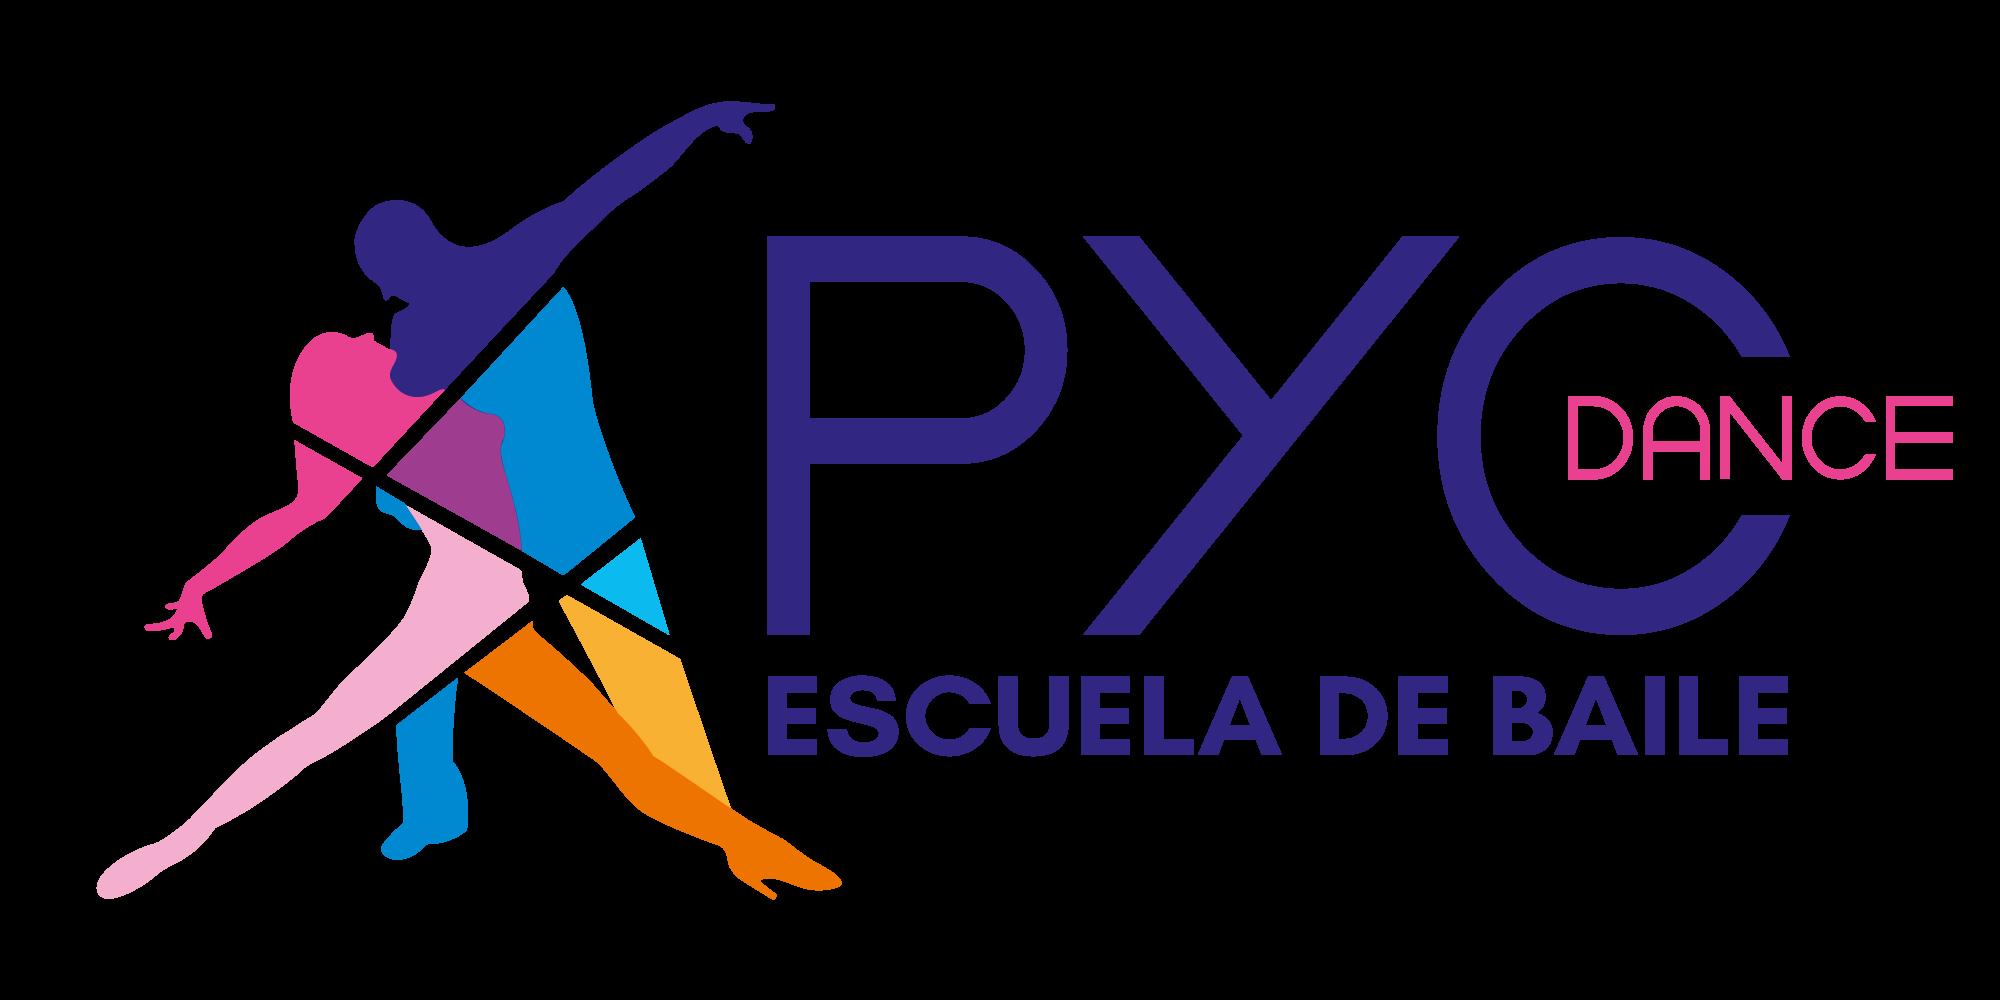 PYCDANCE-logo_nuevo-png